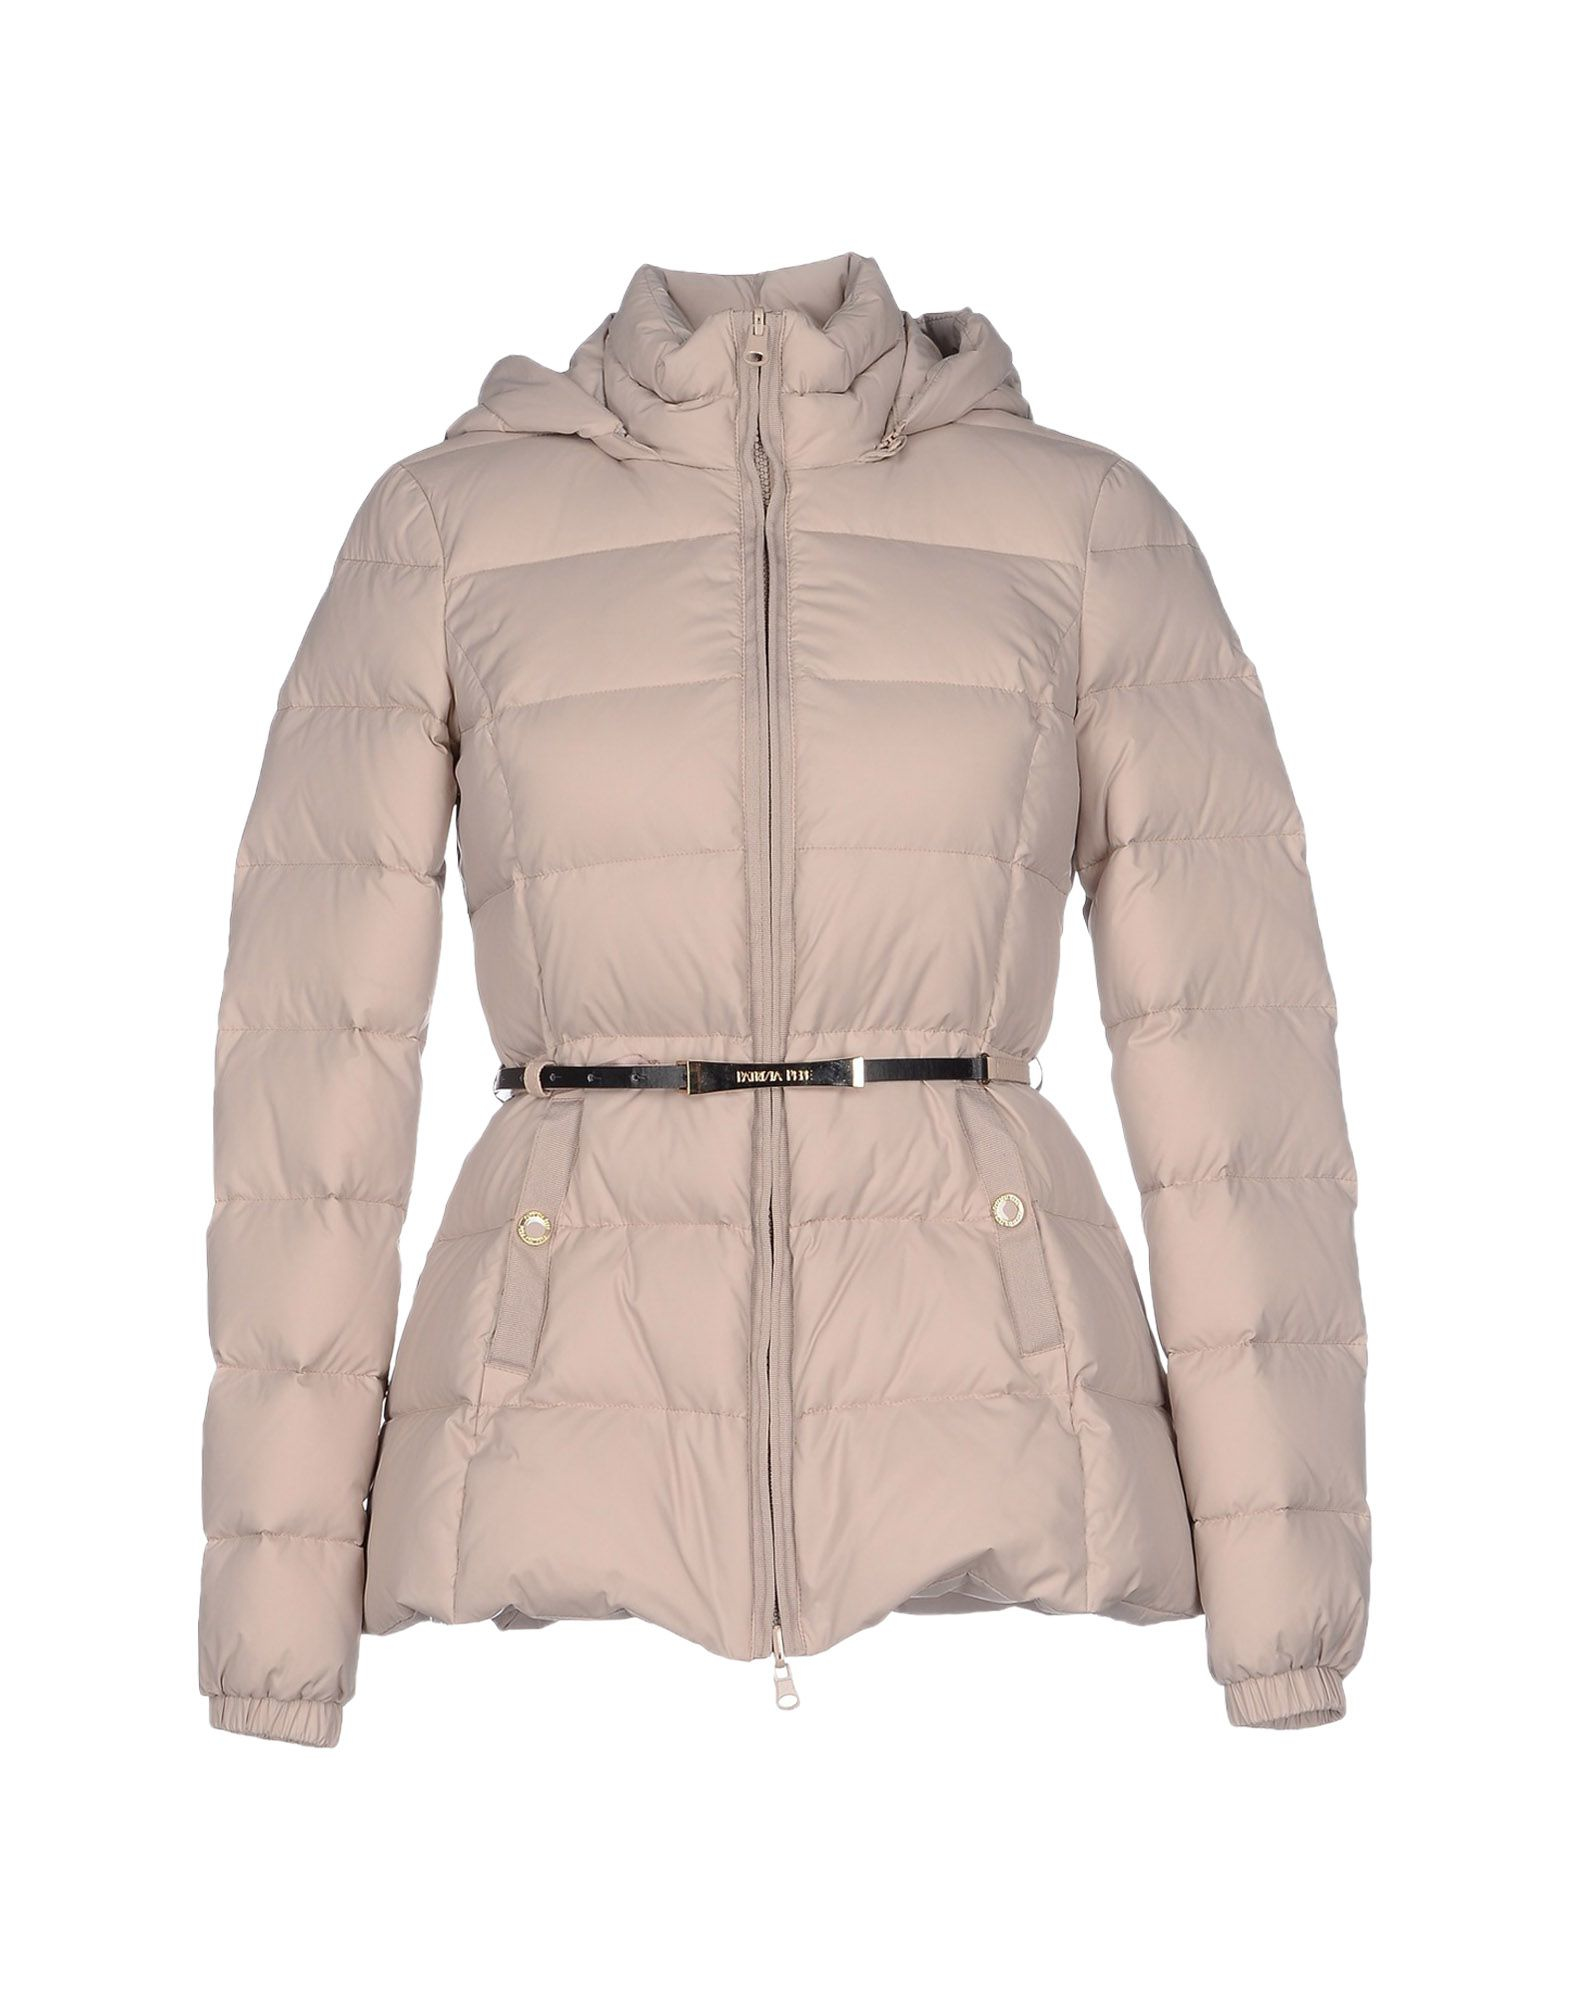 870b73dca6 Patrizia Pepe Down Jacket in Natural - Lyst